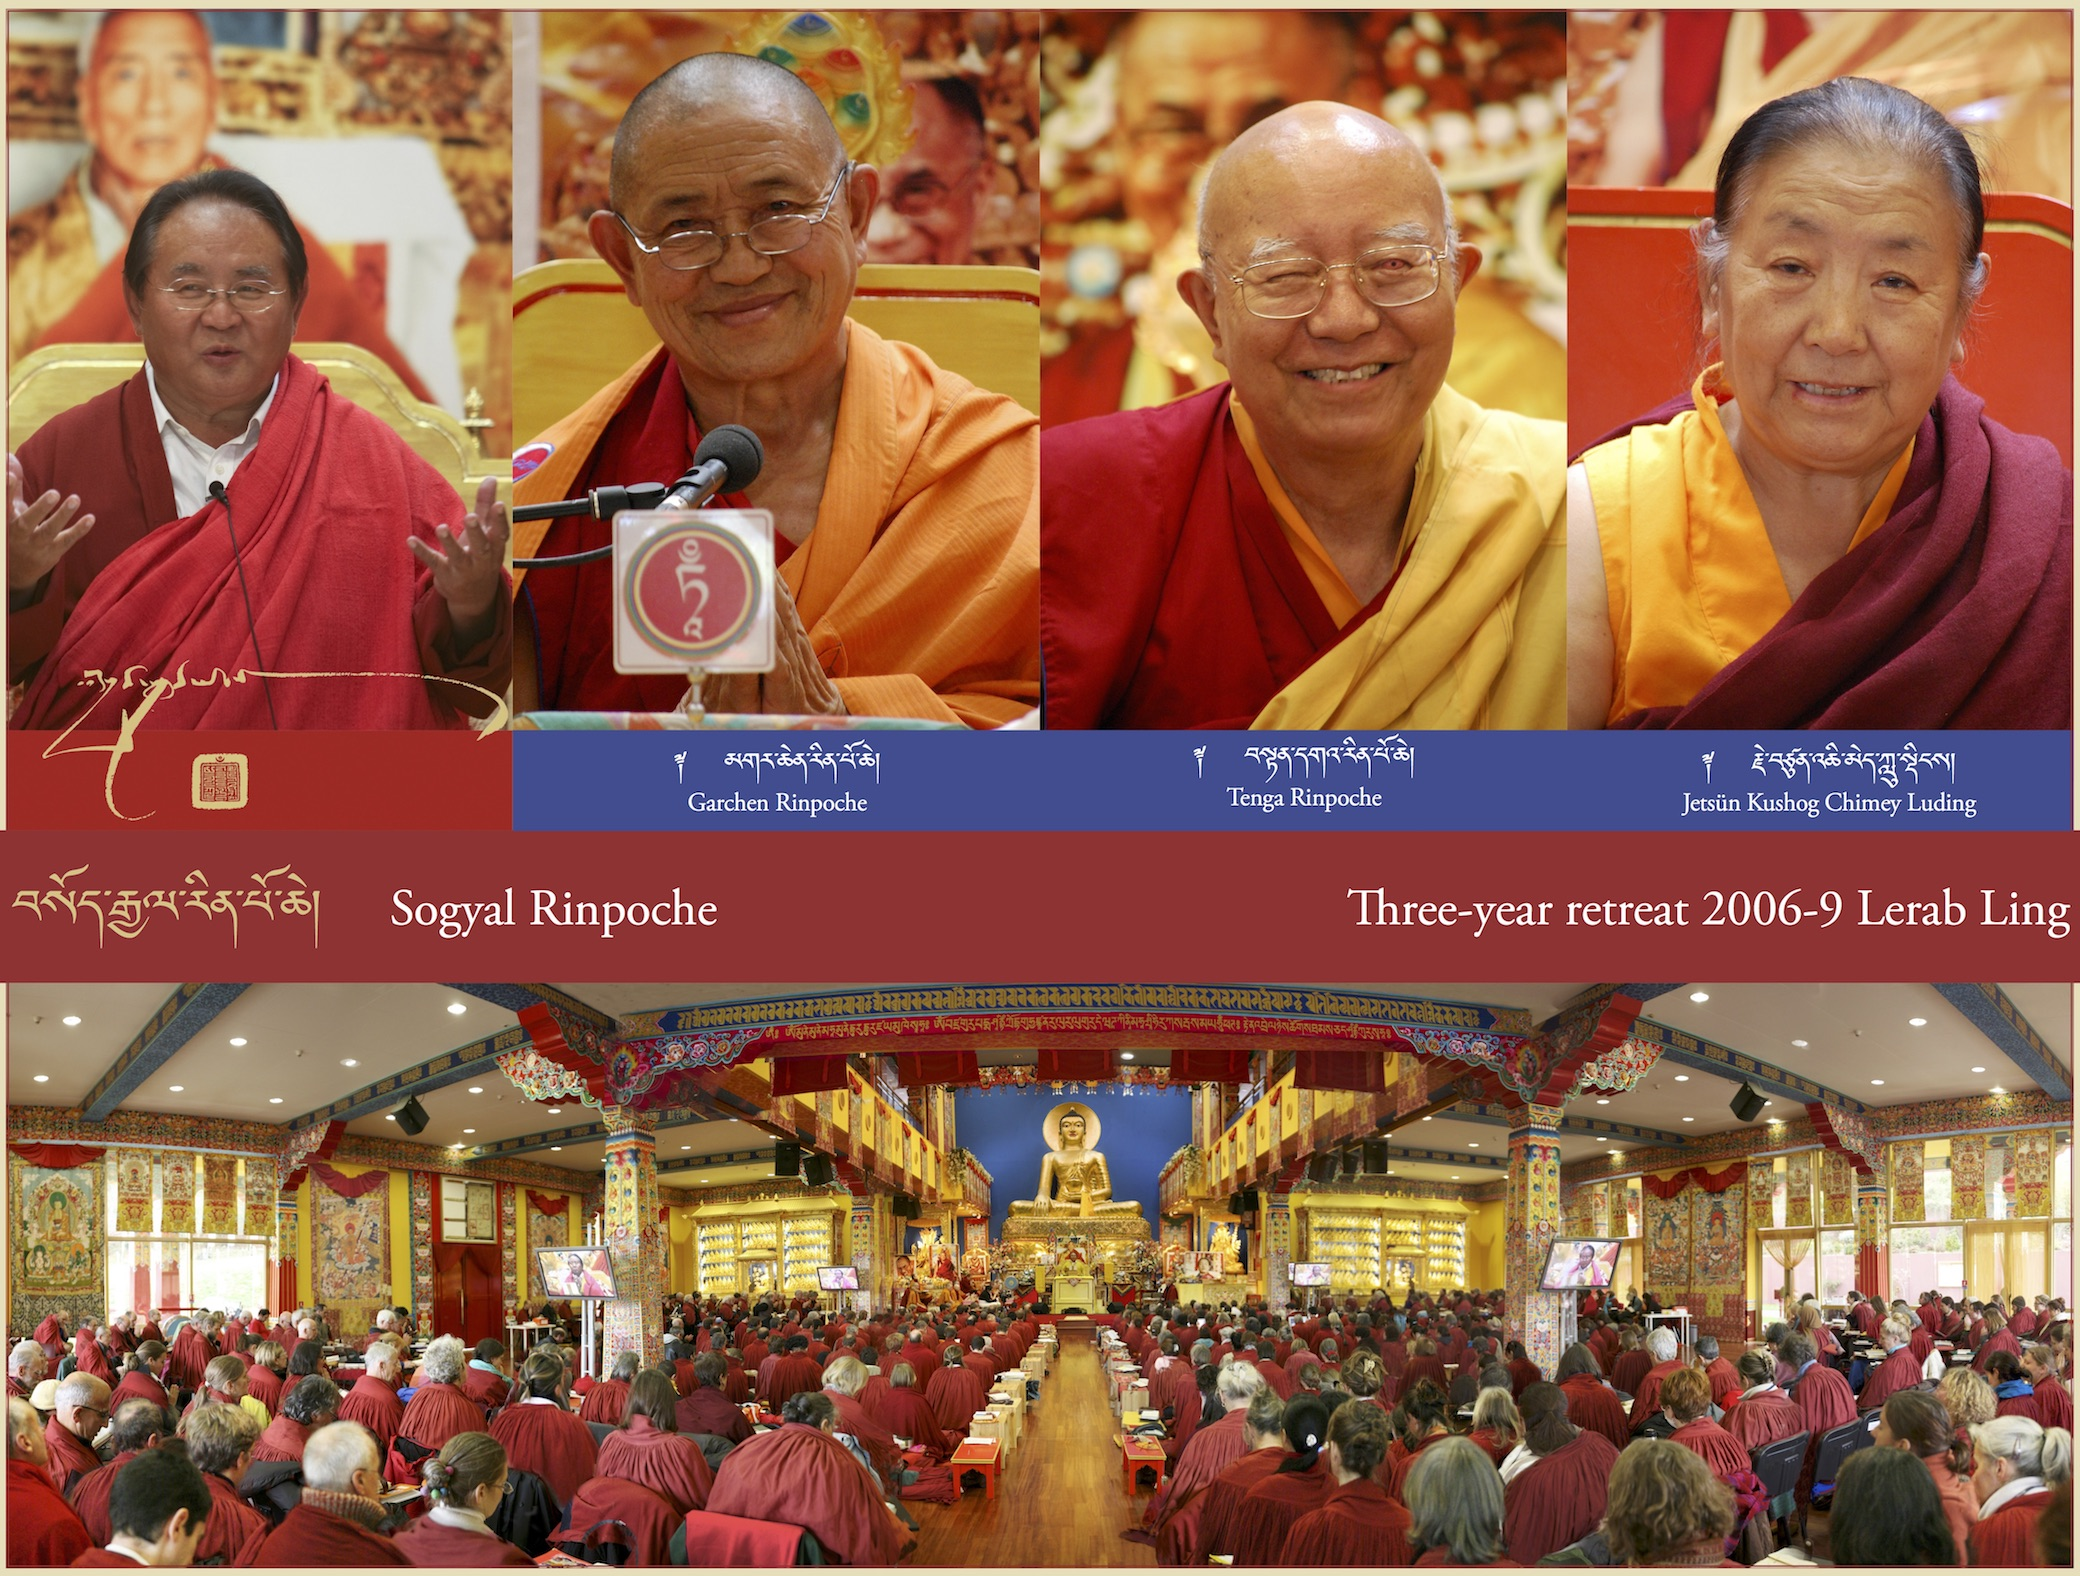 Three-year retreat, 2006-9 Lerab Ling (2)